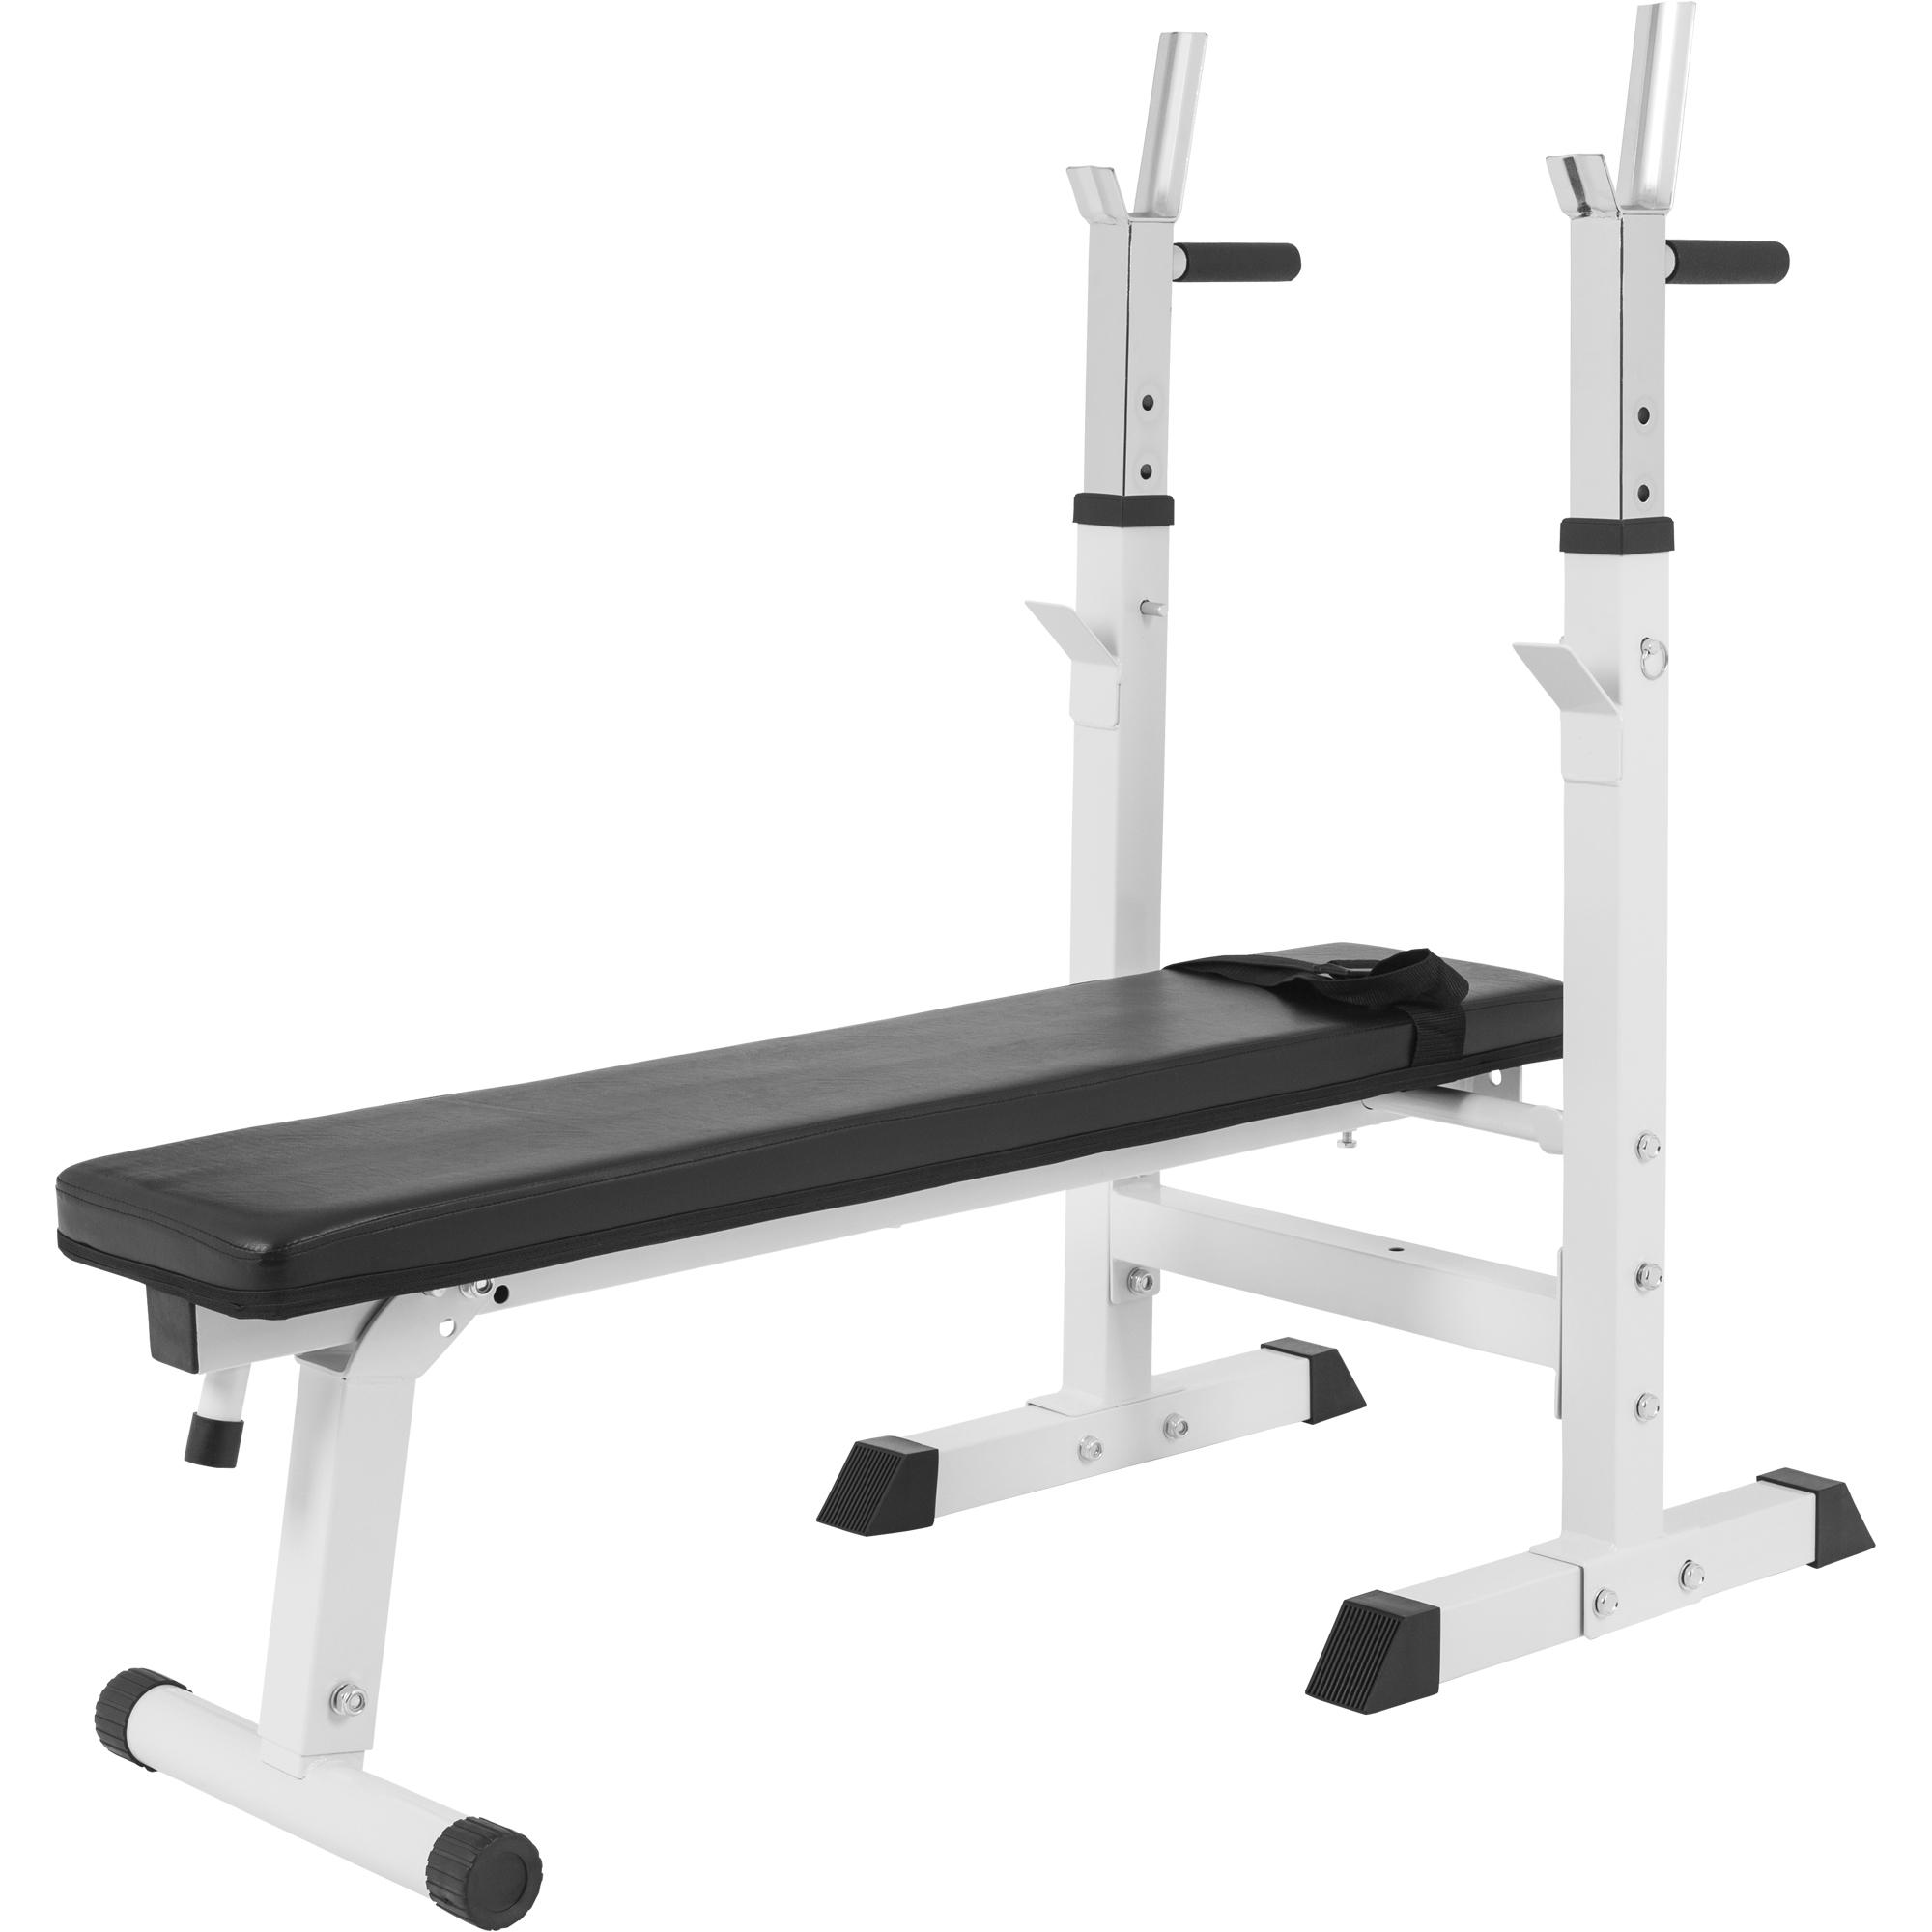 Banc de musculation avec support de barres 10000118 blanc 10000118white - Exercice de musculation avec banc ...